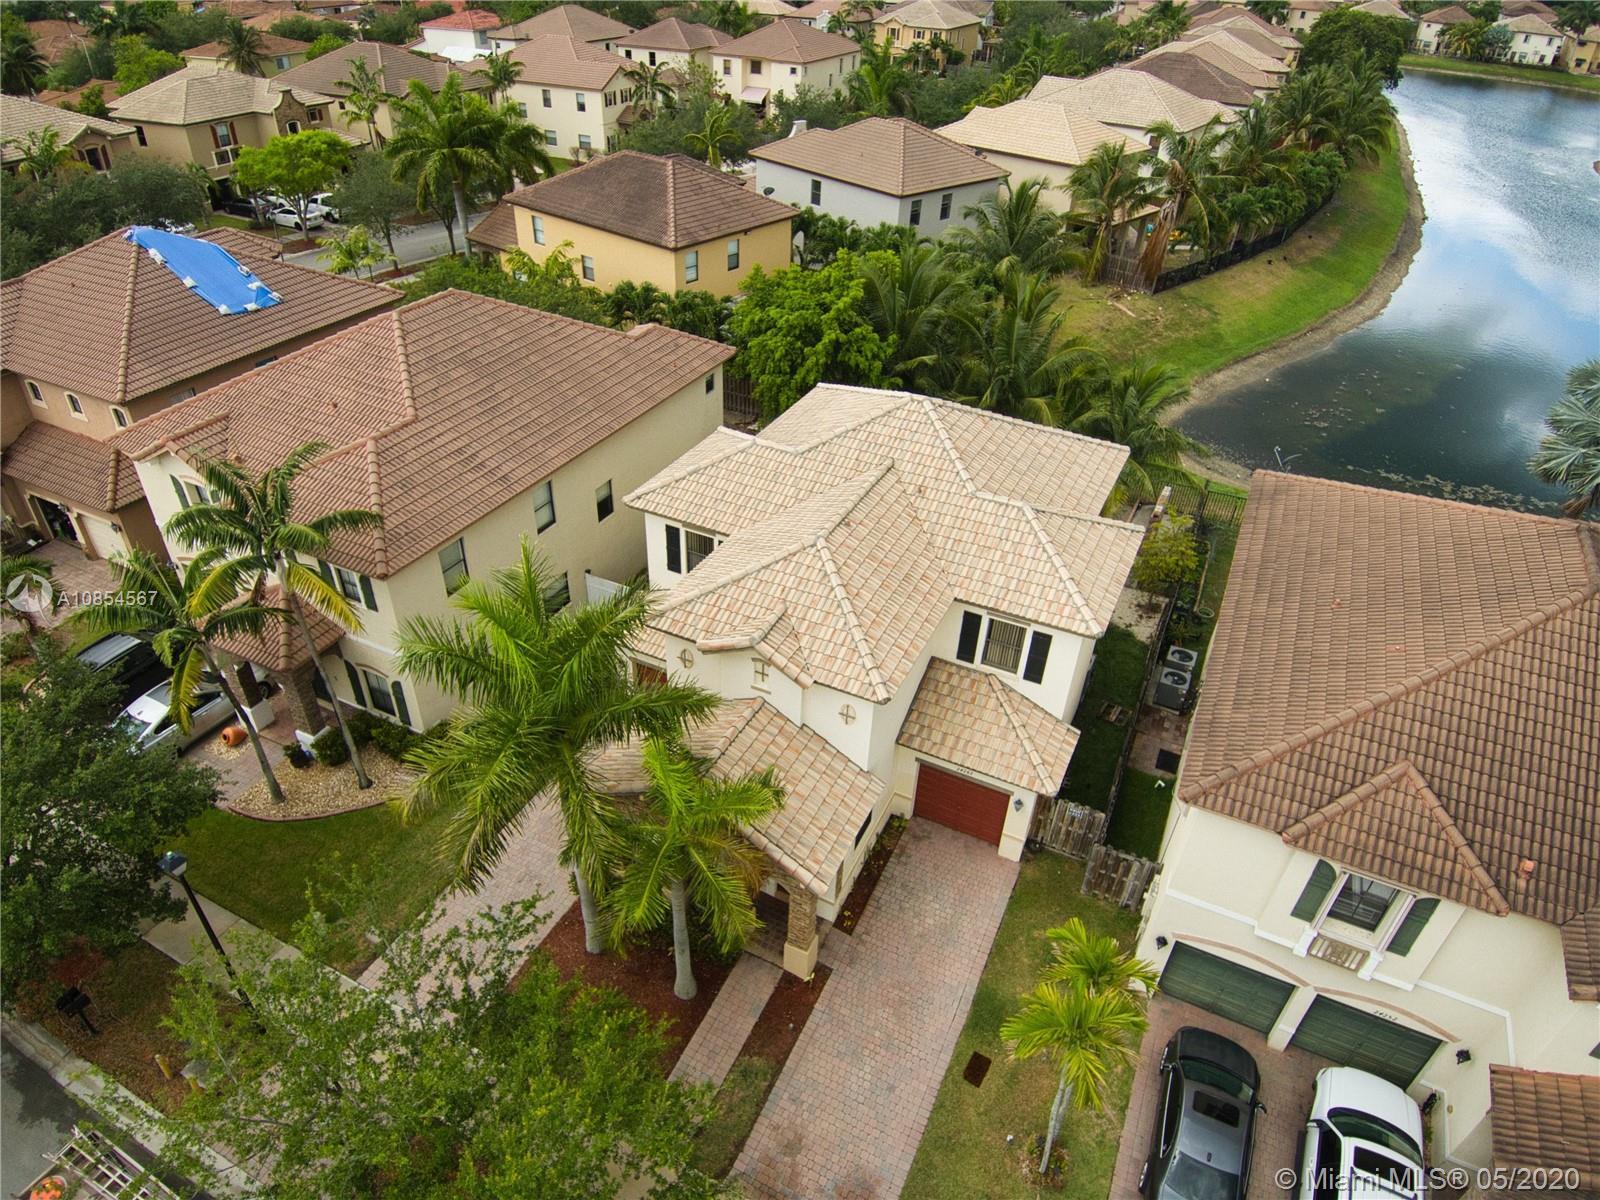 24262 SW 112th Ct, Homestead, FL 33032 - Homestead, FL real estate listing